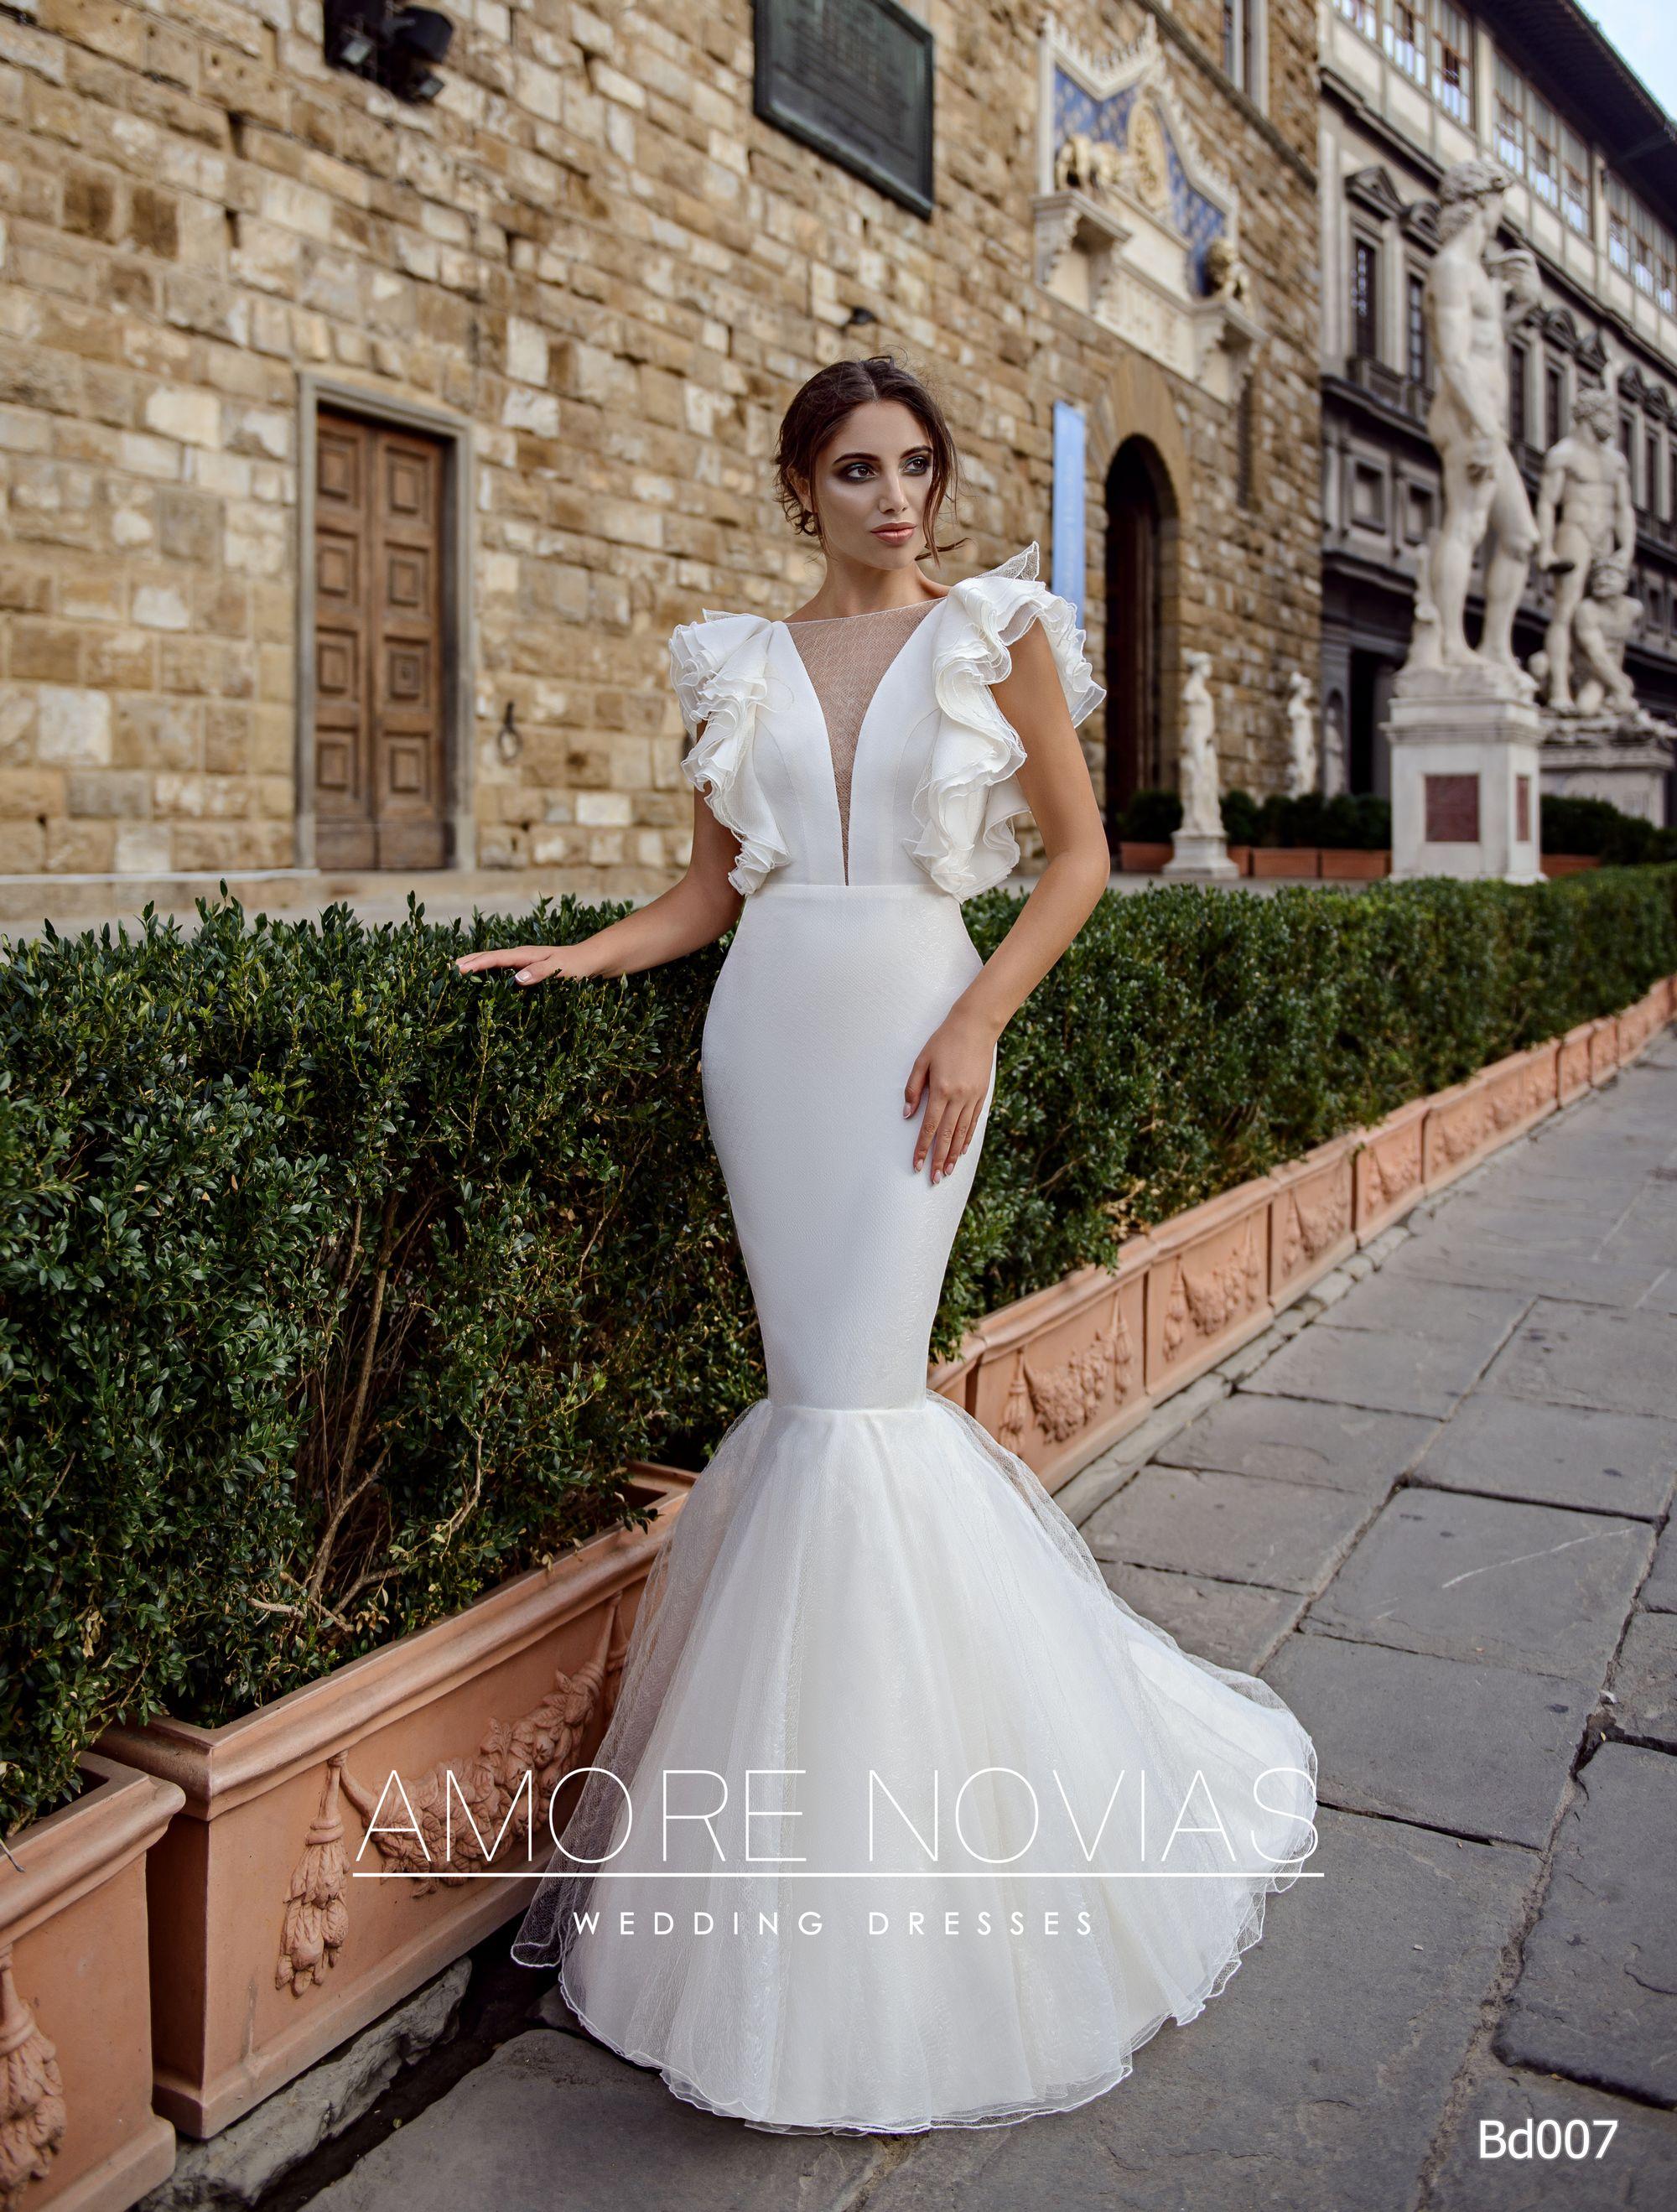 http://amore-novias.com/images/stories/virtuemart/product/bd007-------(1).jpg